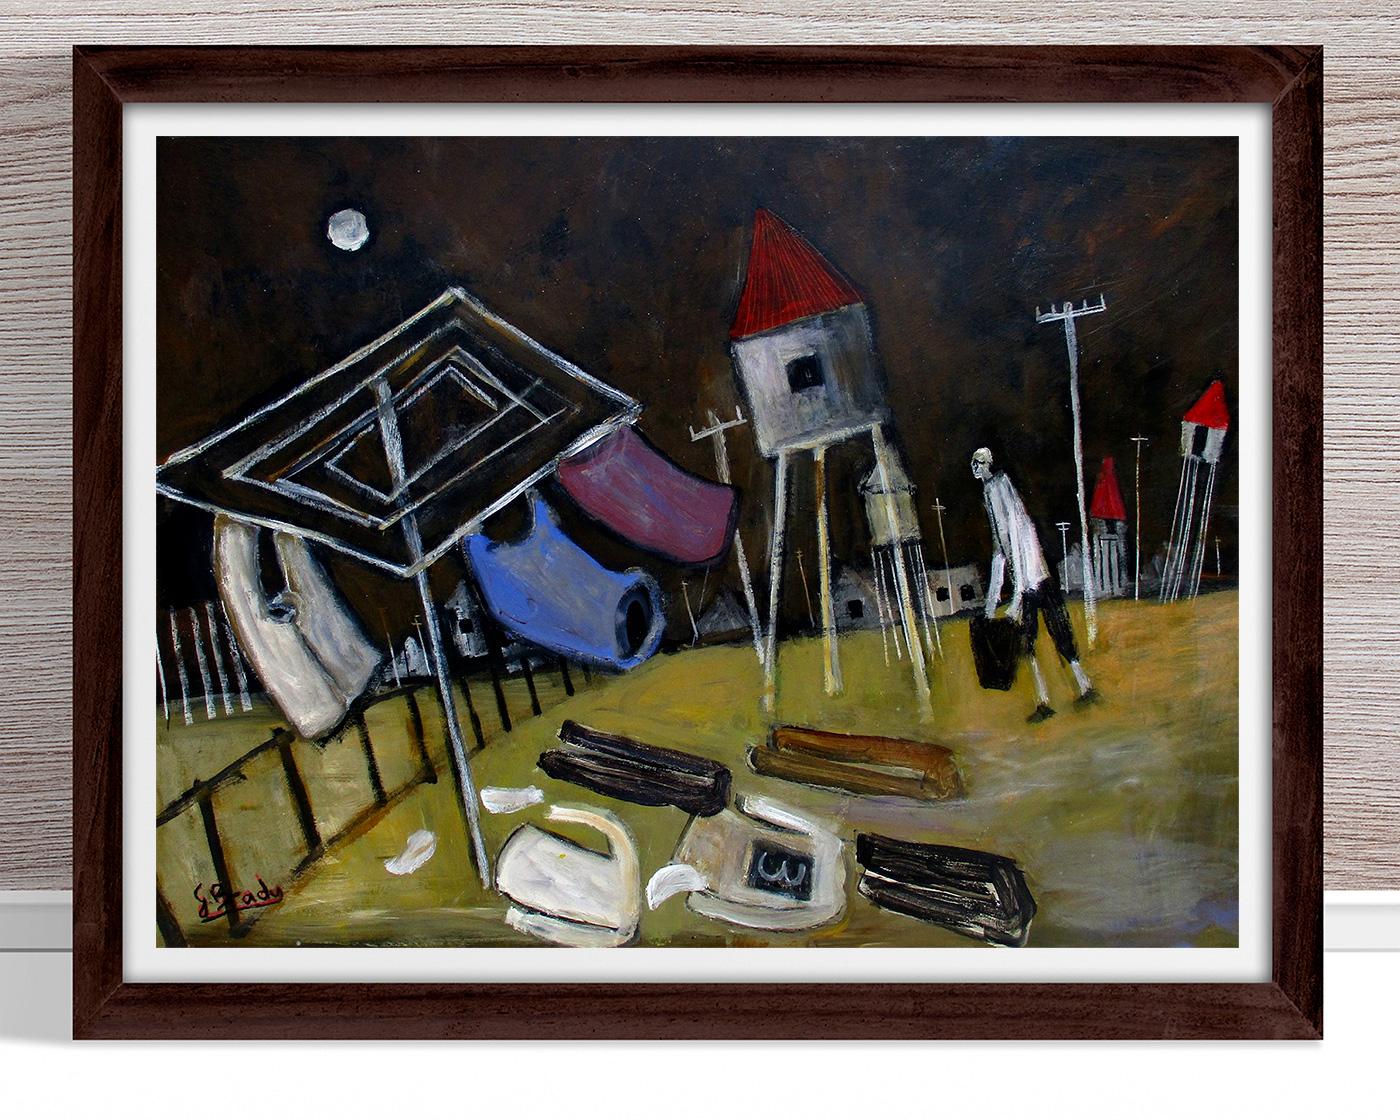 Glenn Brady - Kookaburra' Framed